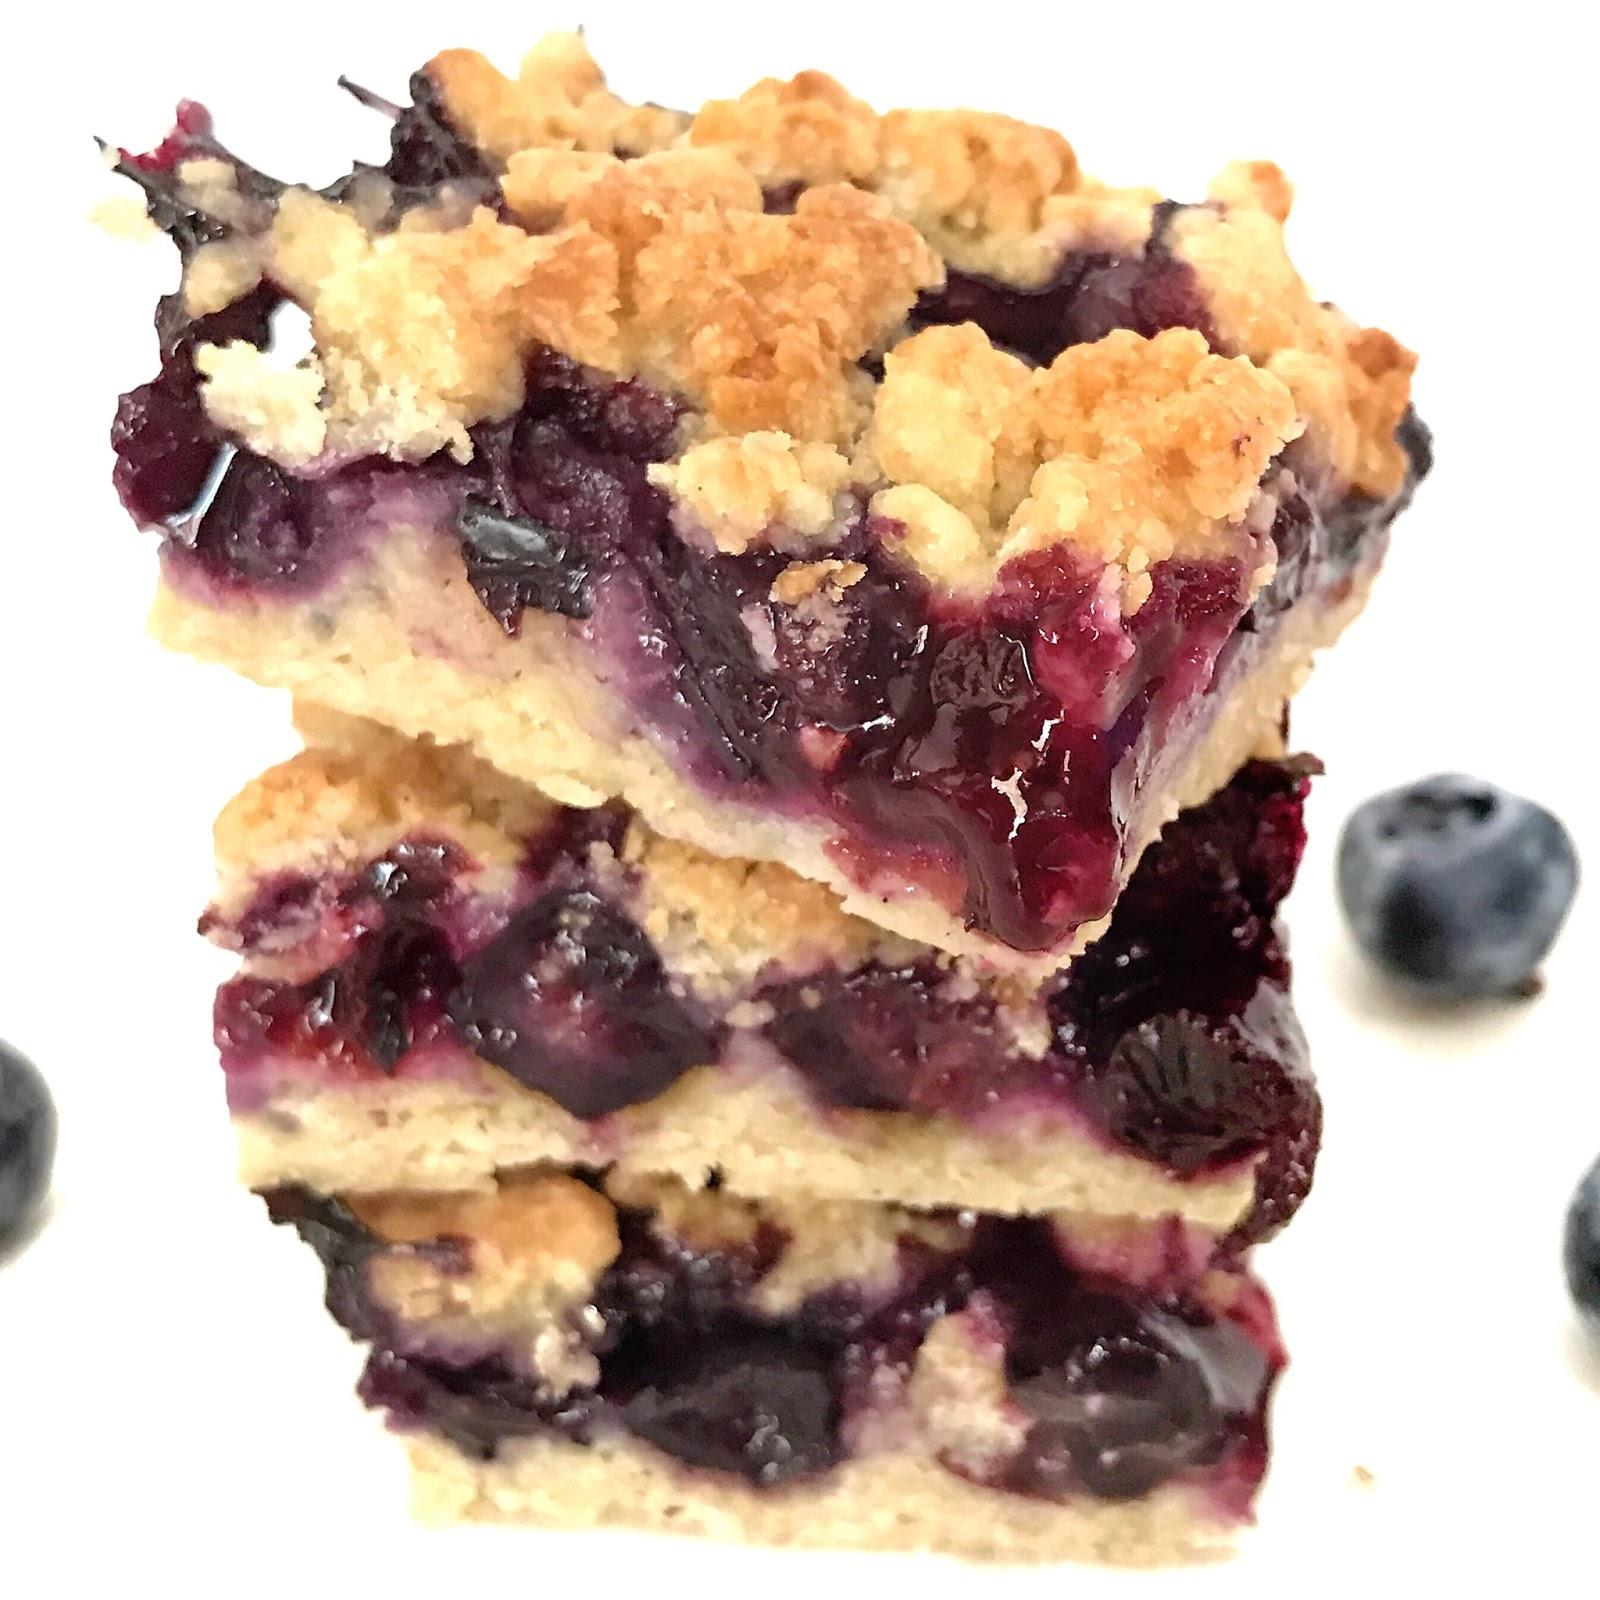 Blueberries Blueberries Blueberry Pie Blueberry Ice Cream Blueberry Cheesecake Blueberry Brownie Blueberry Crumble Blueberry Cookies